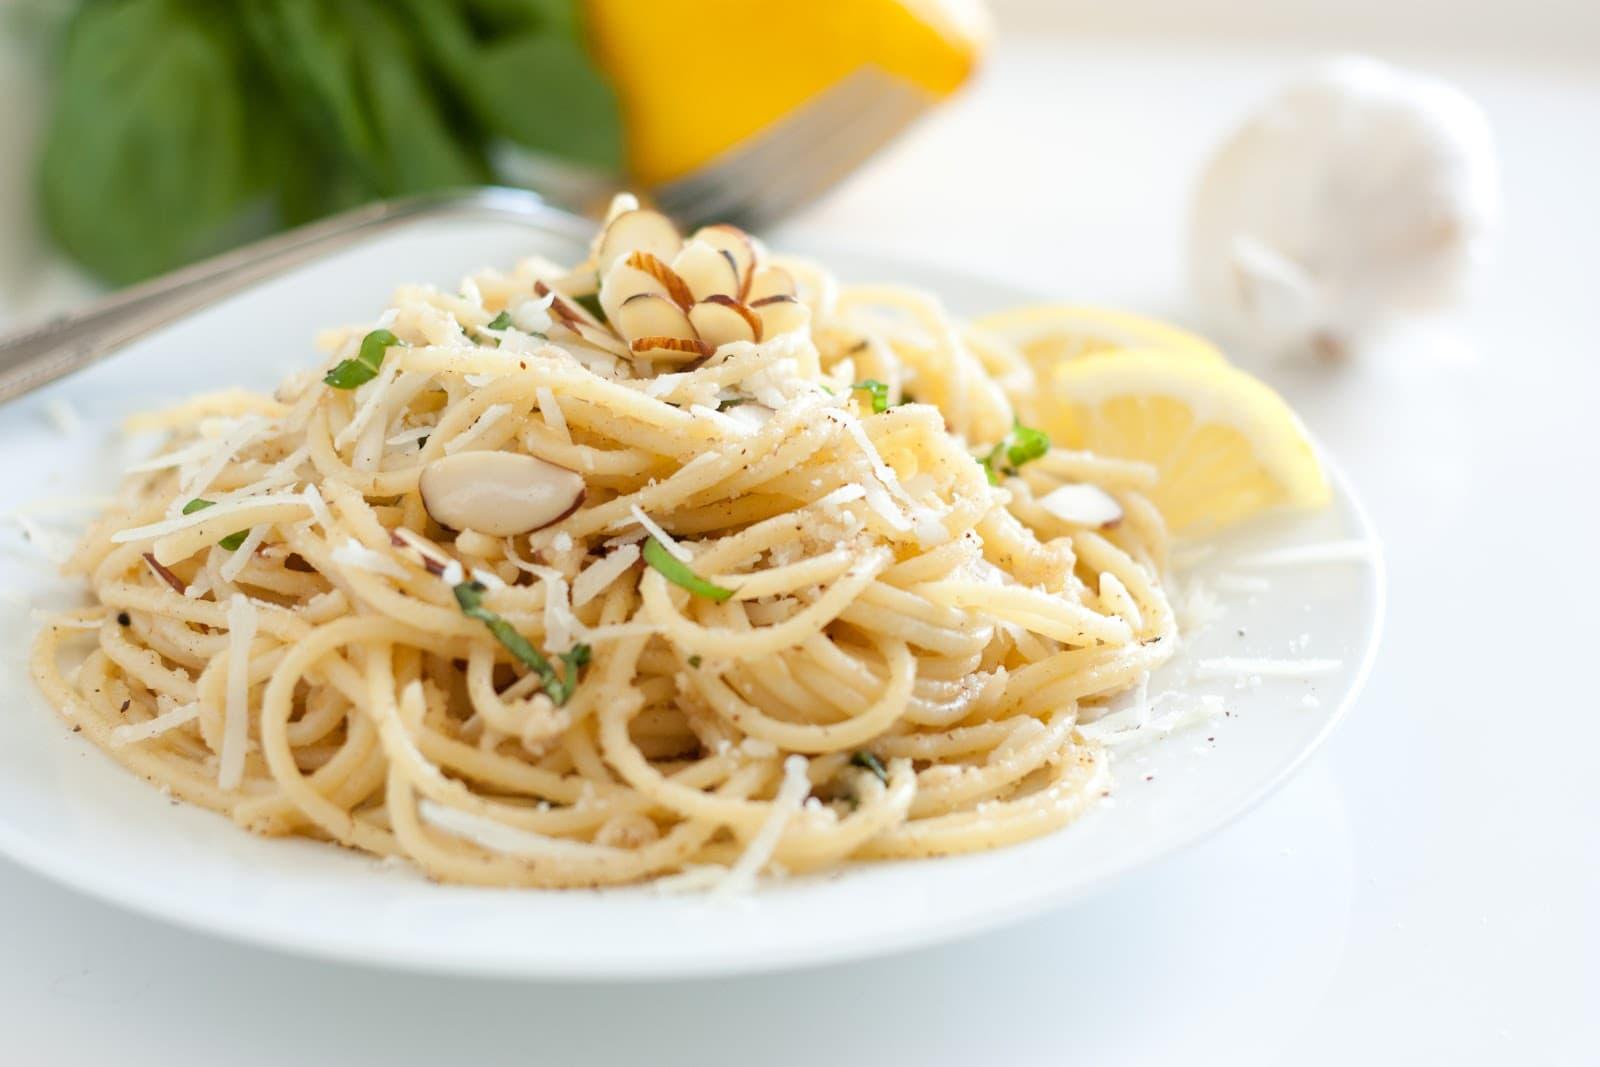 how to help digest pastas